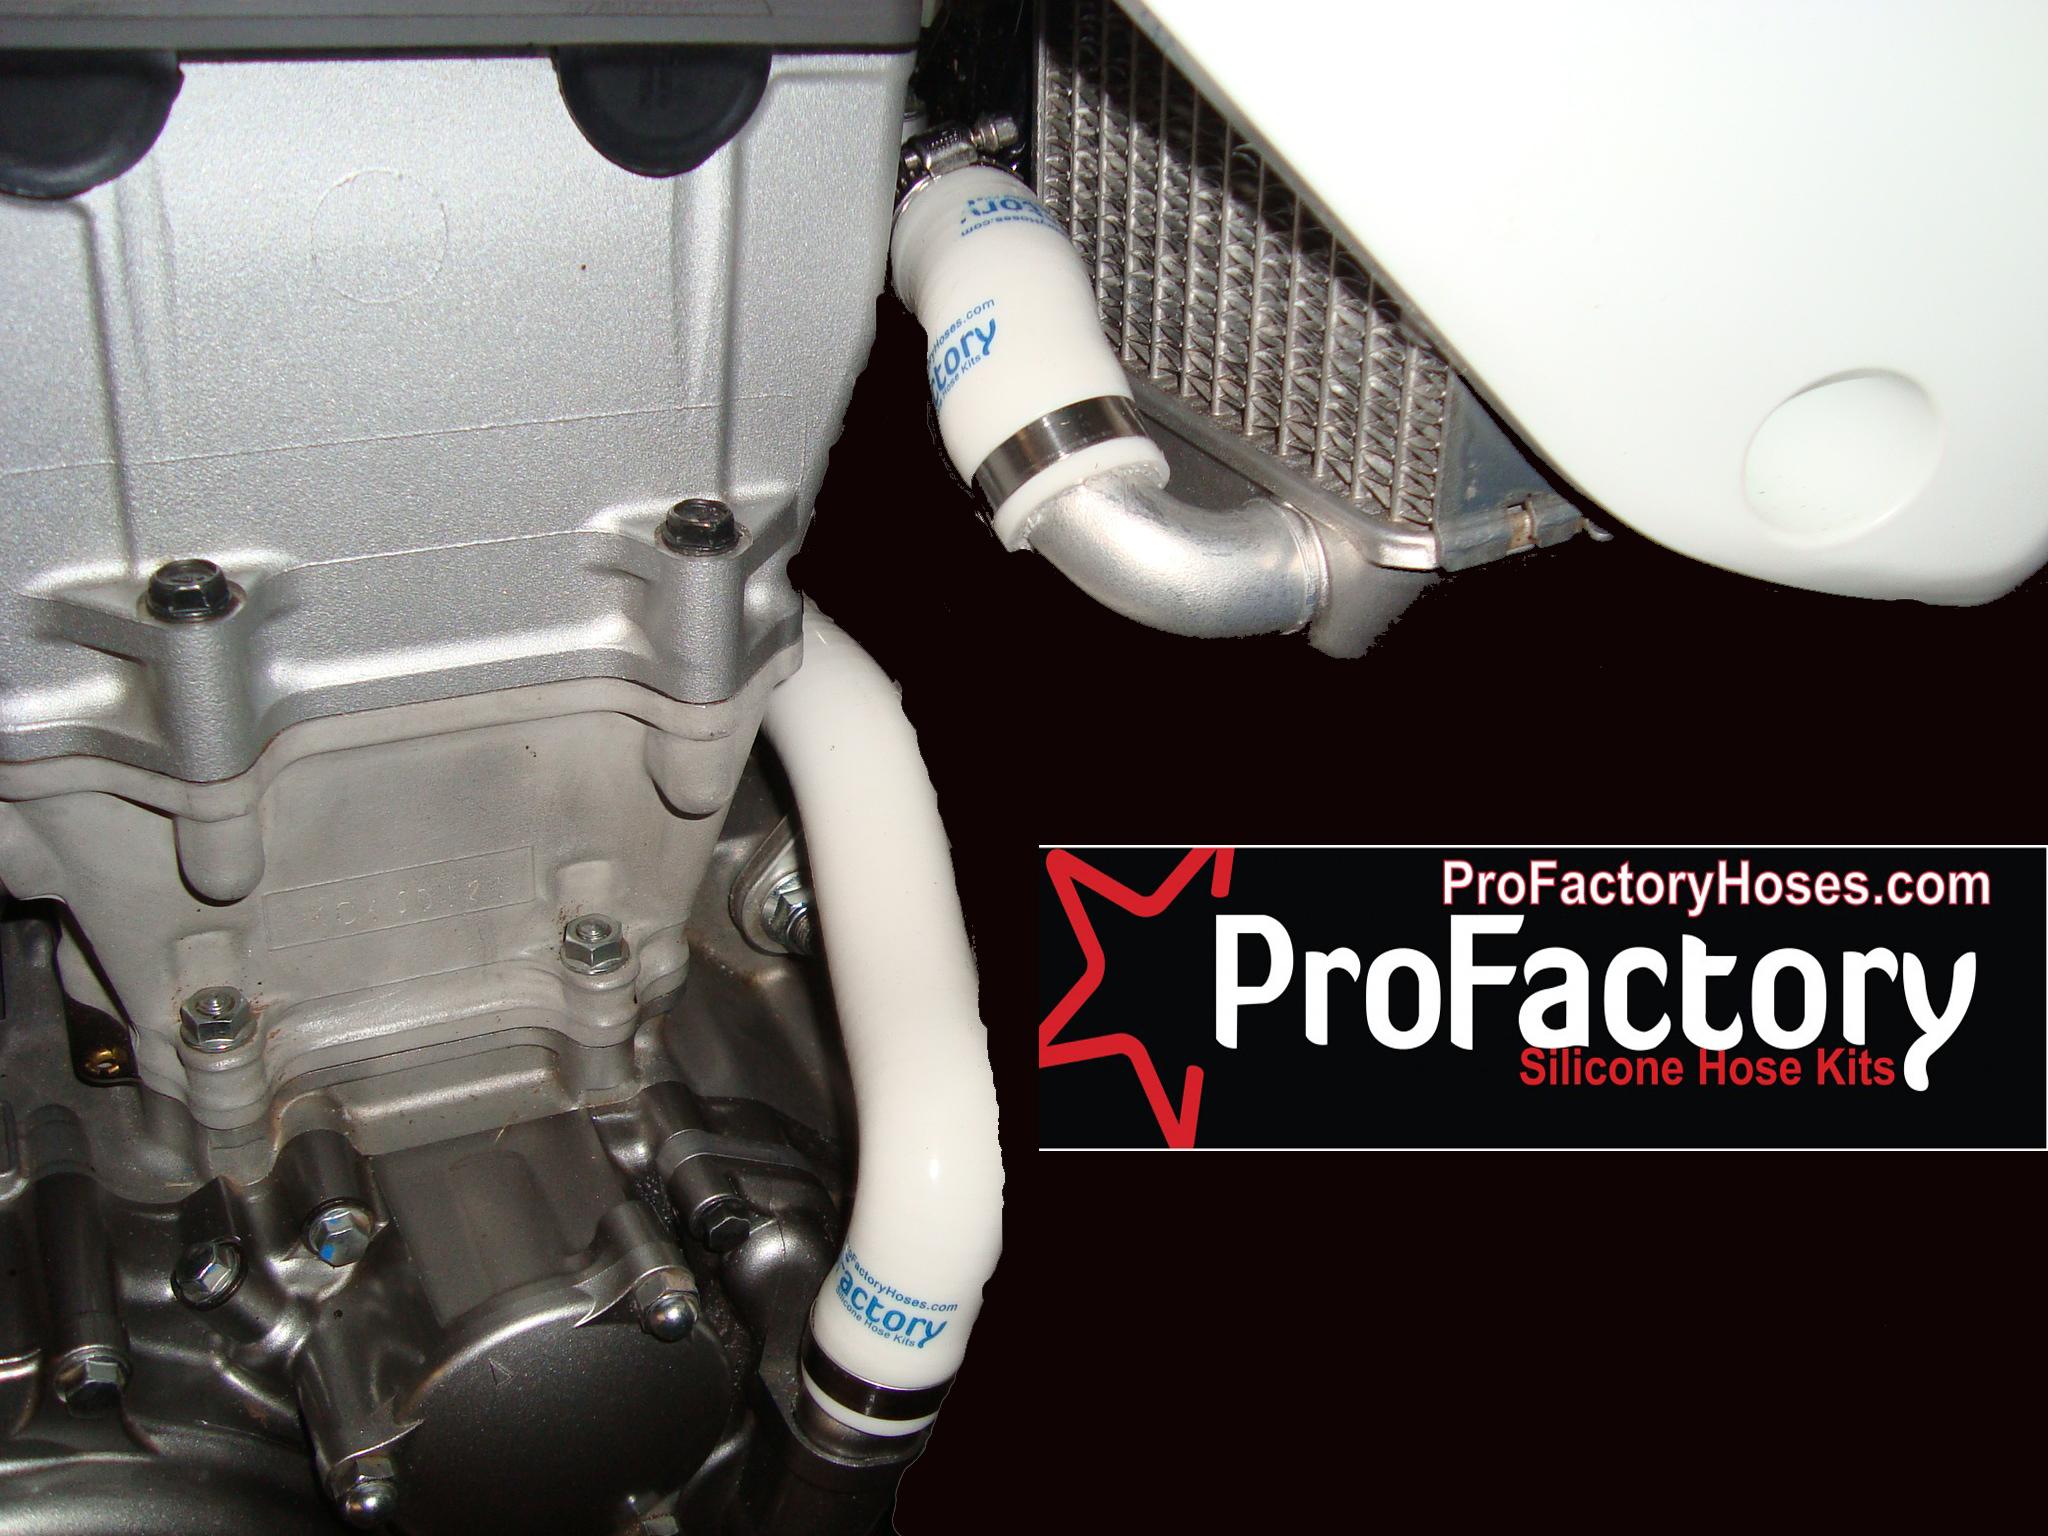 drz-400-radiator-hose-kit-image2.jpg